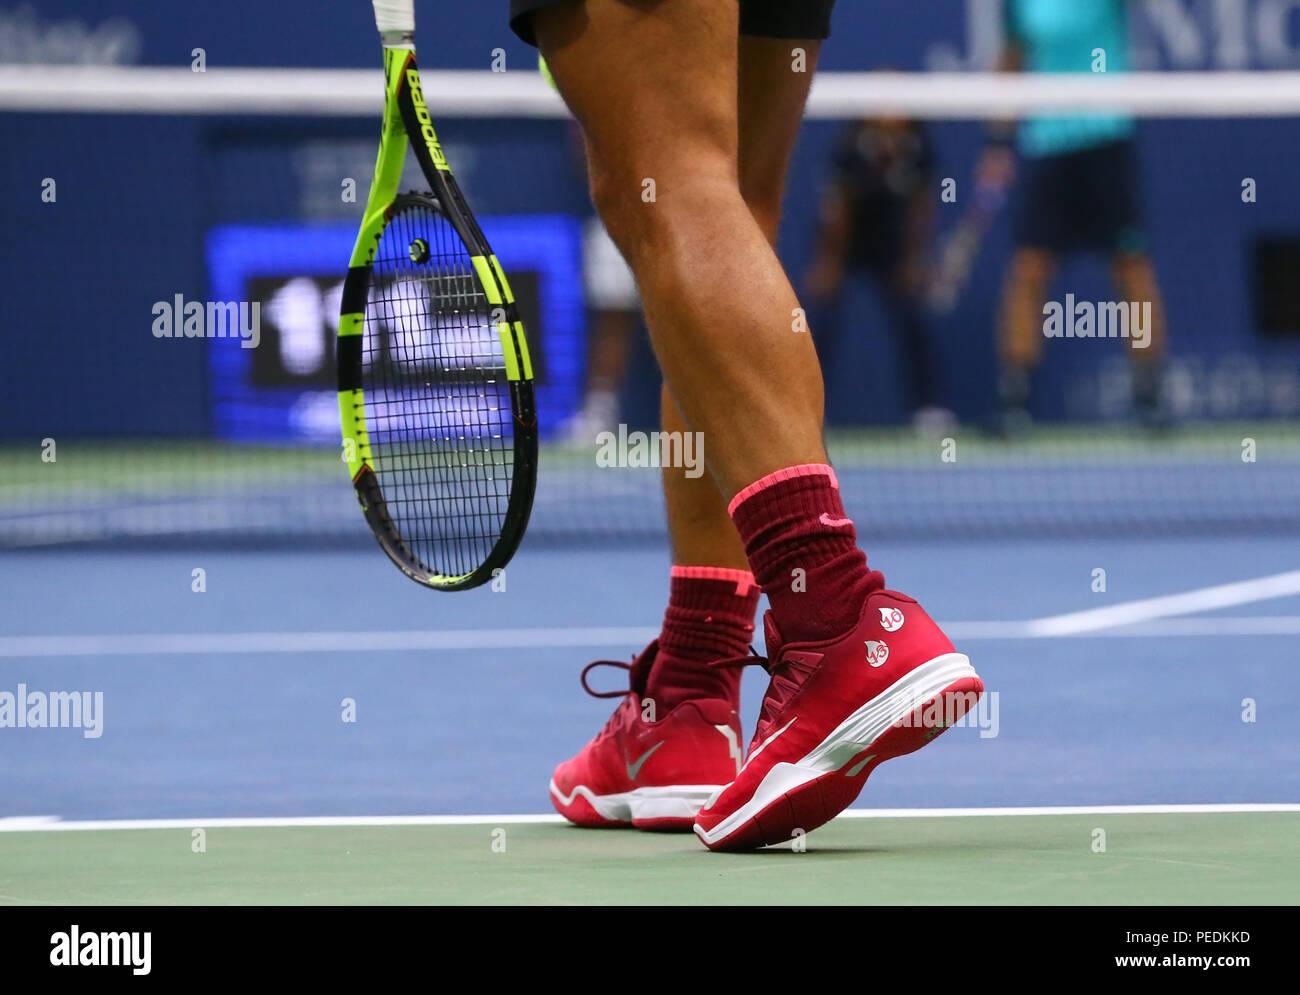 Grand Slam Champion Rafael Nadal Of Spain Wears Custom Nike Tennis Shoes During Us Open 2017 Final Match Stock Photo Alamy